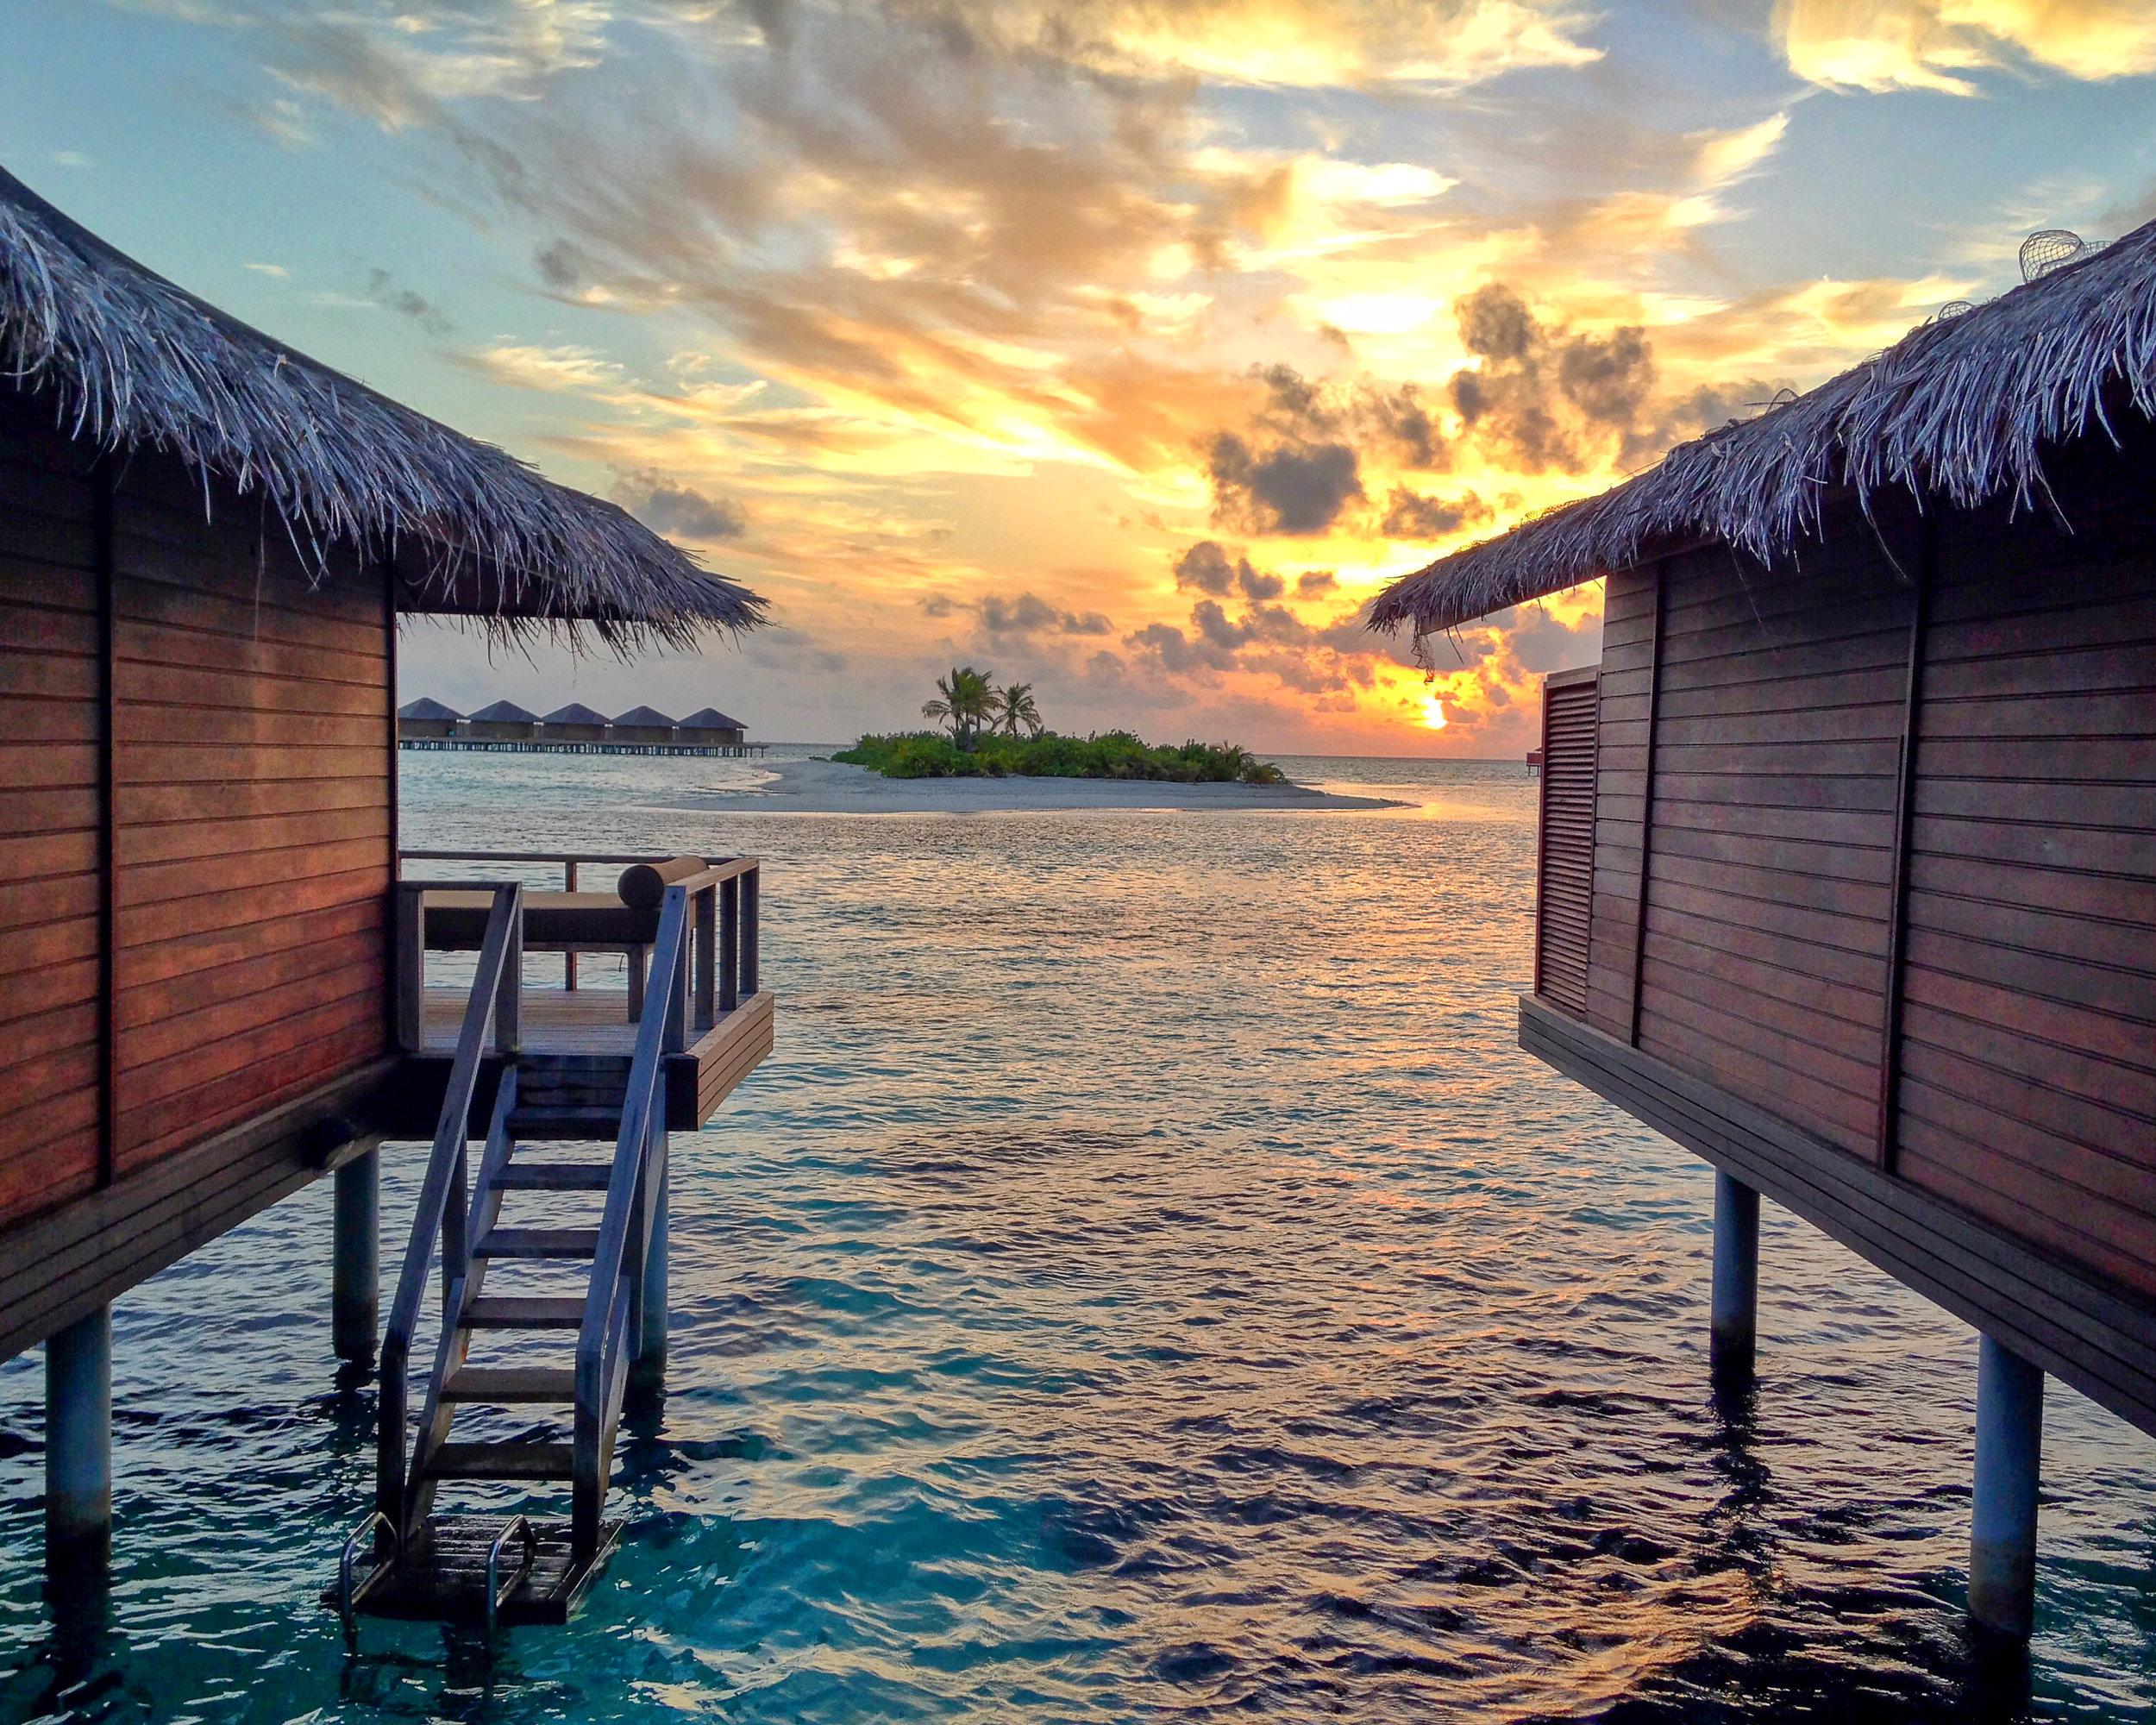 Maldives Sunset Between Bungalows